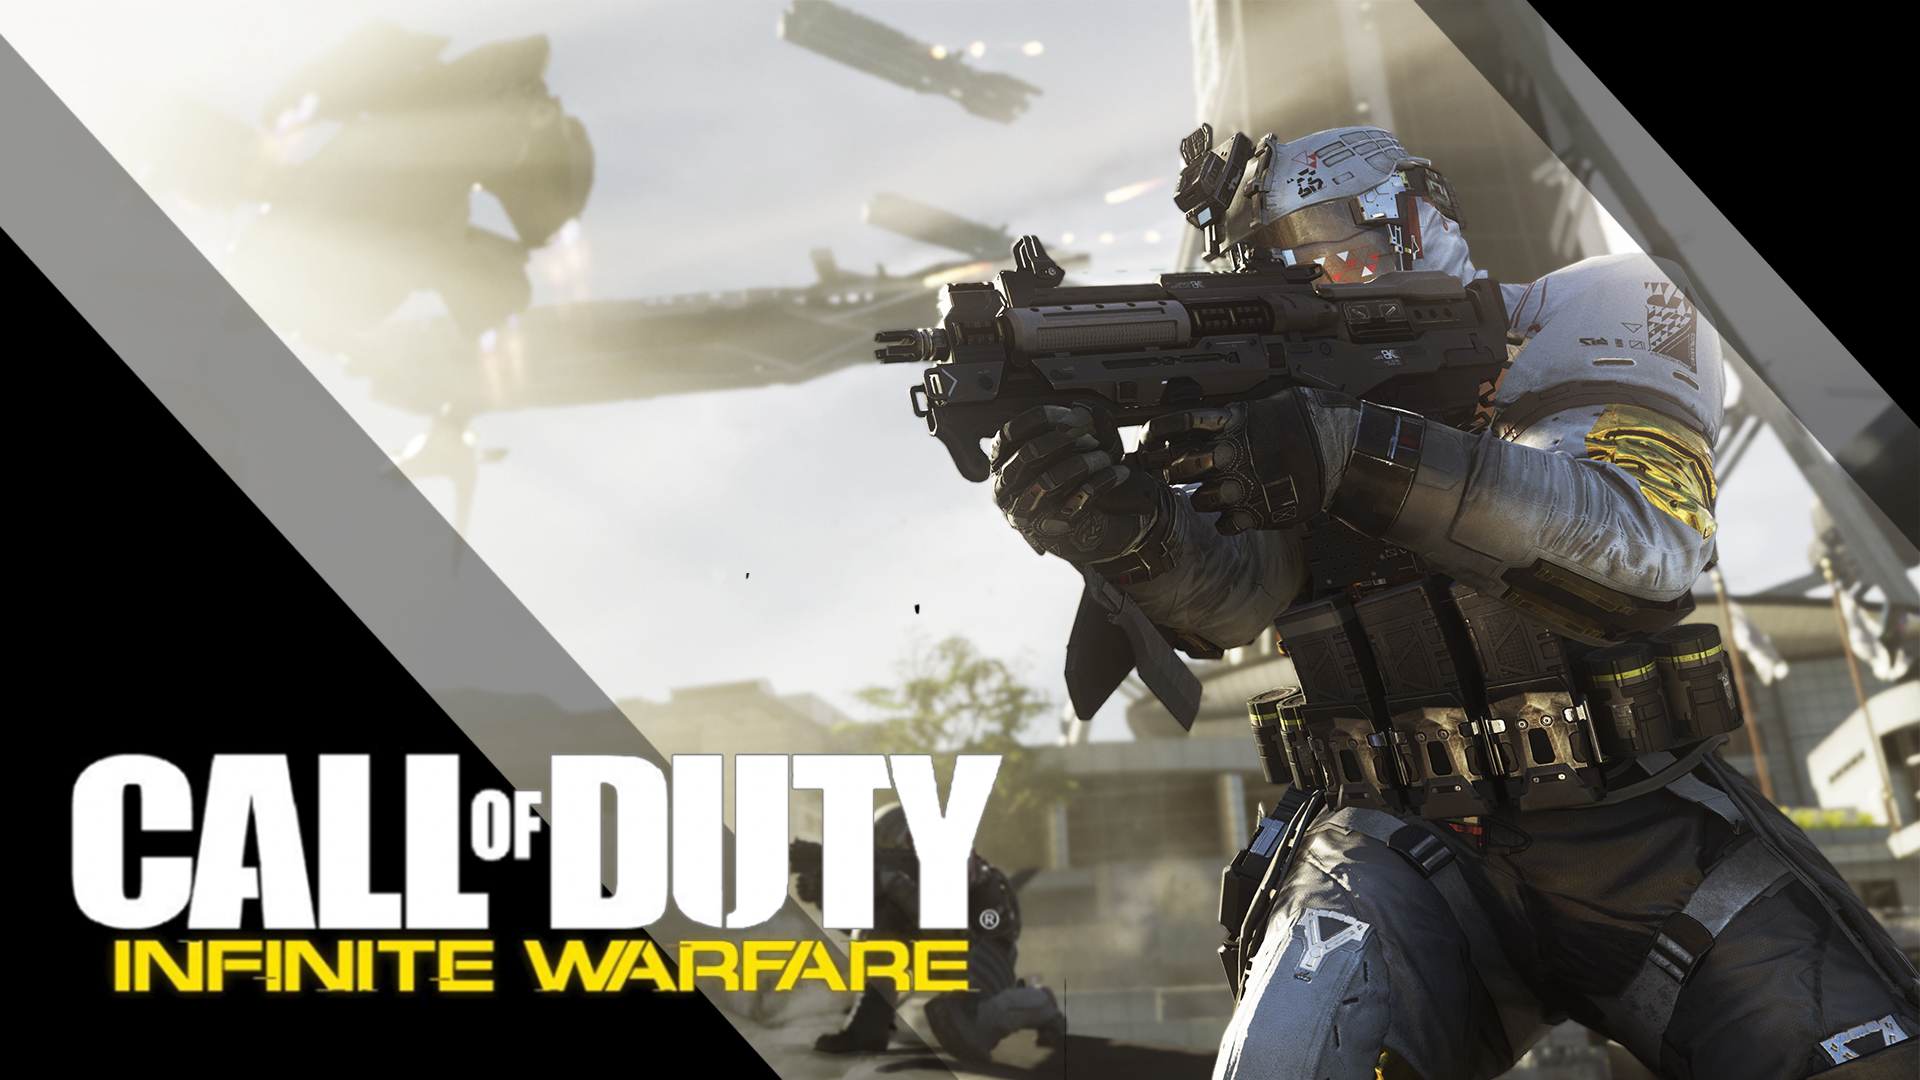 Call Of Duty   Call Of Duty Infinite Warfare Wallpaper 4k 1920x1080